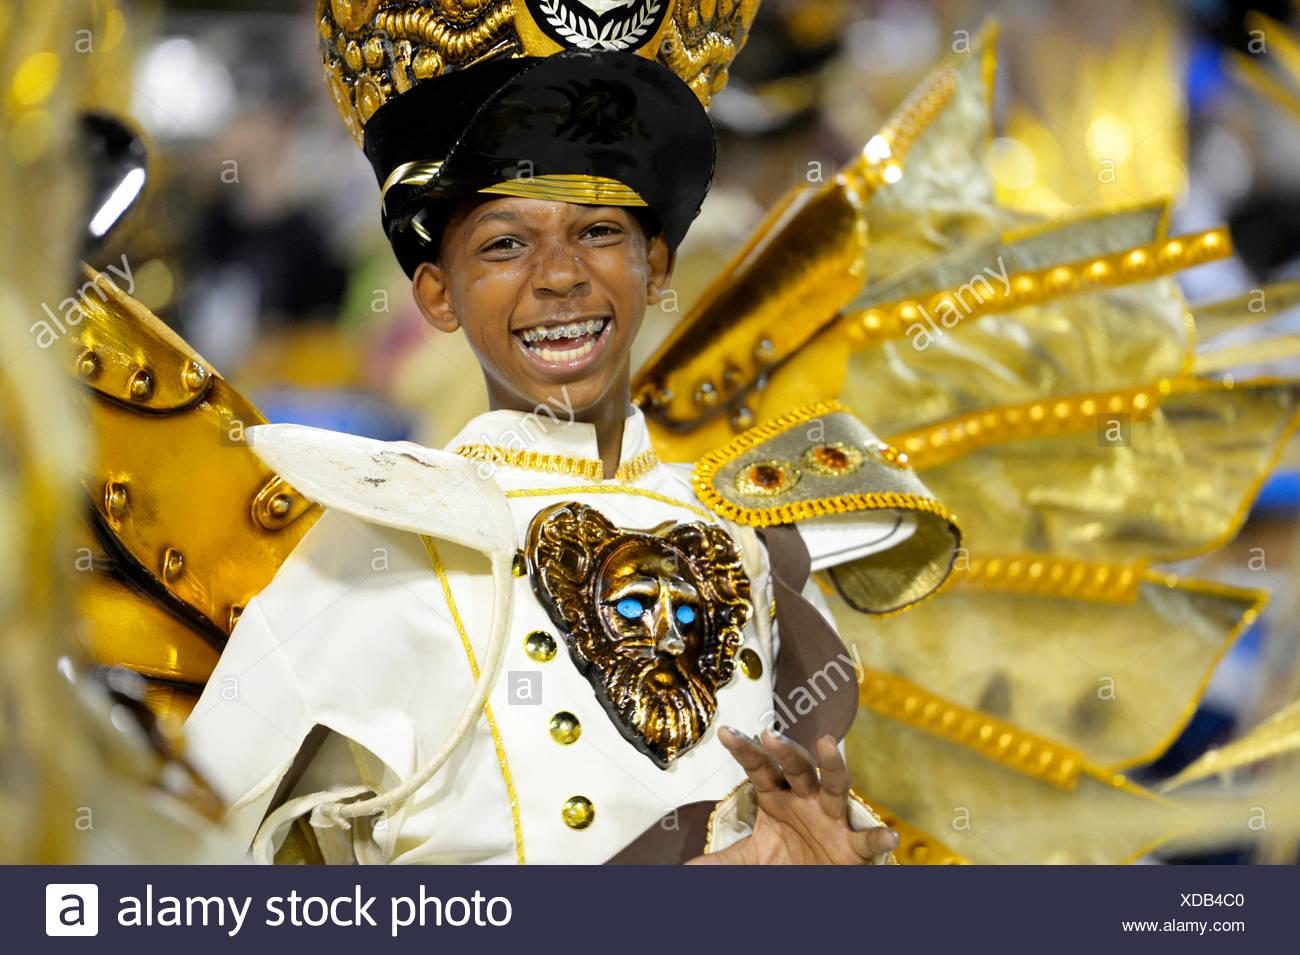 Brazilian Carnival Boy Stock Photos \u0026 Brazilian Carnival Boy